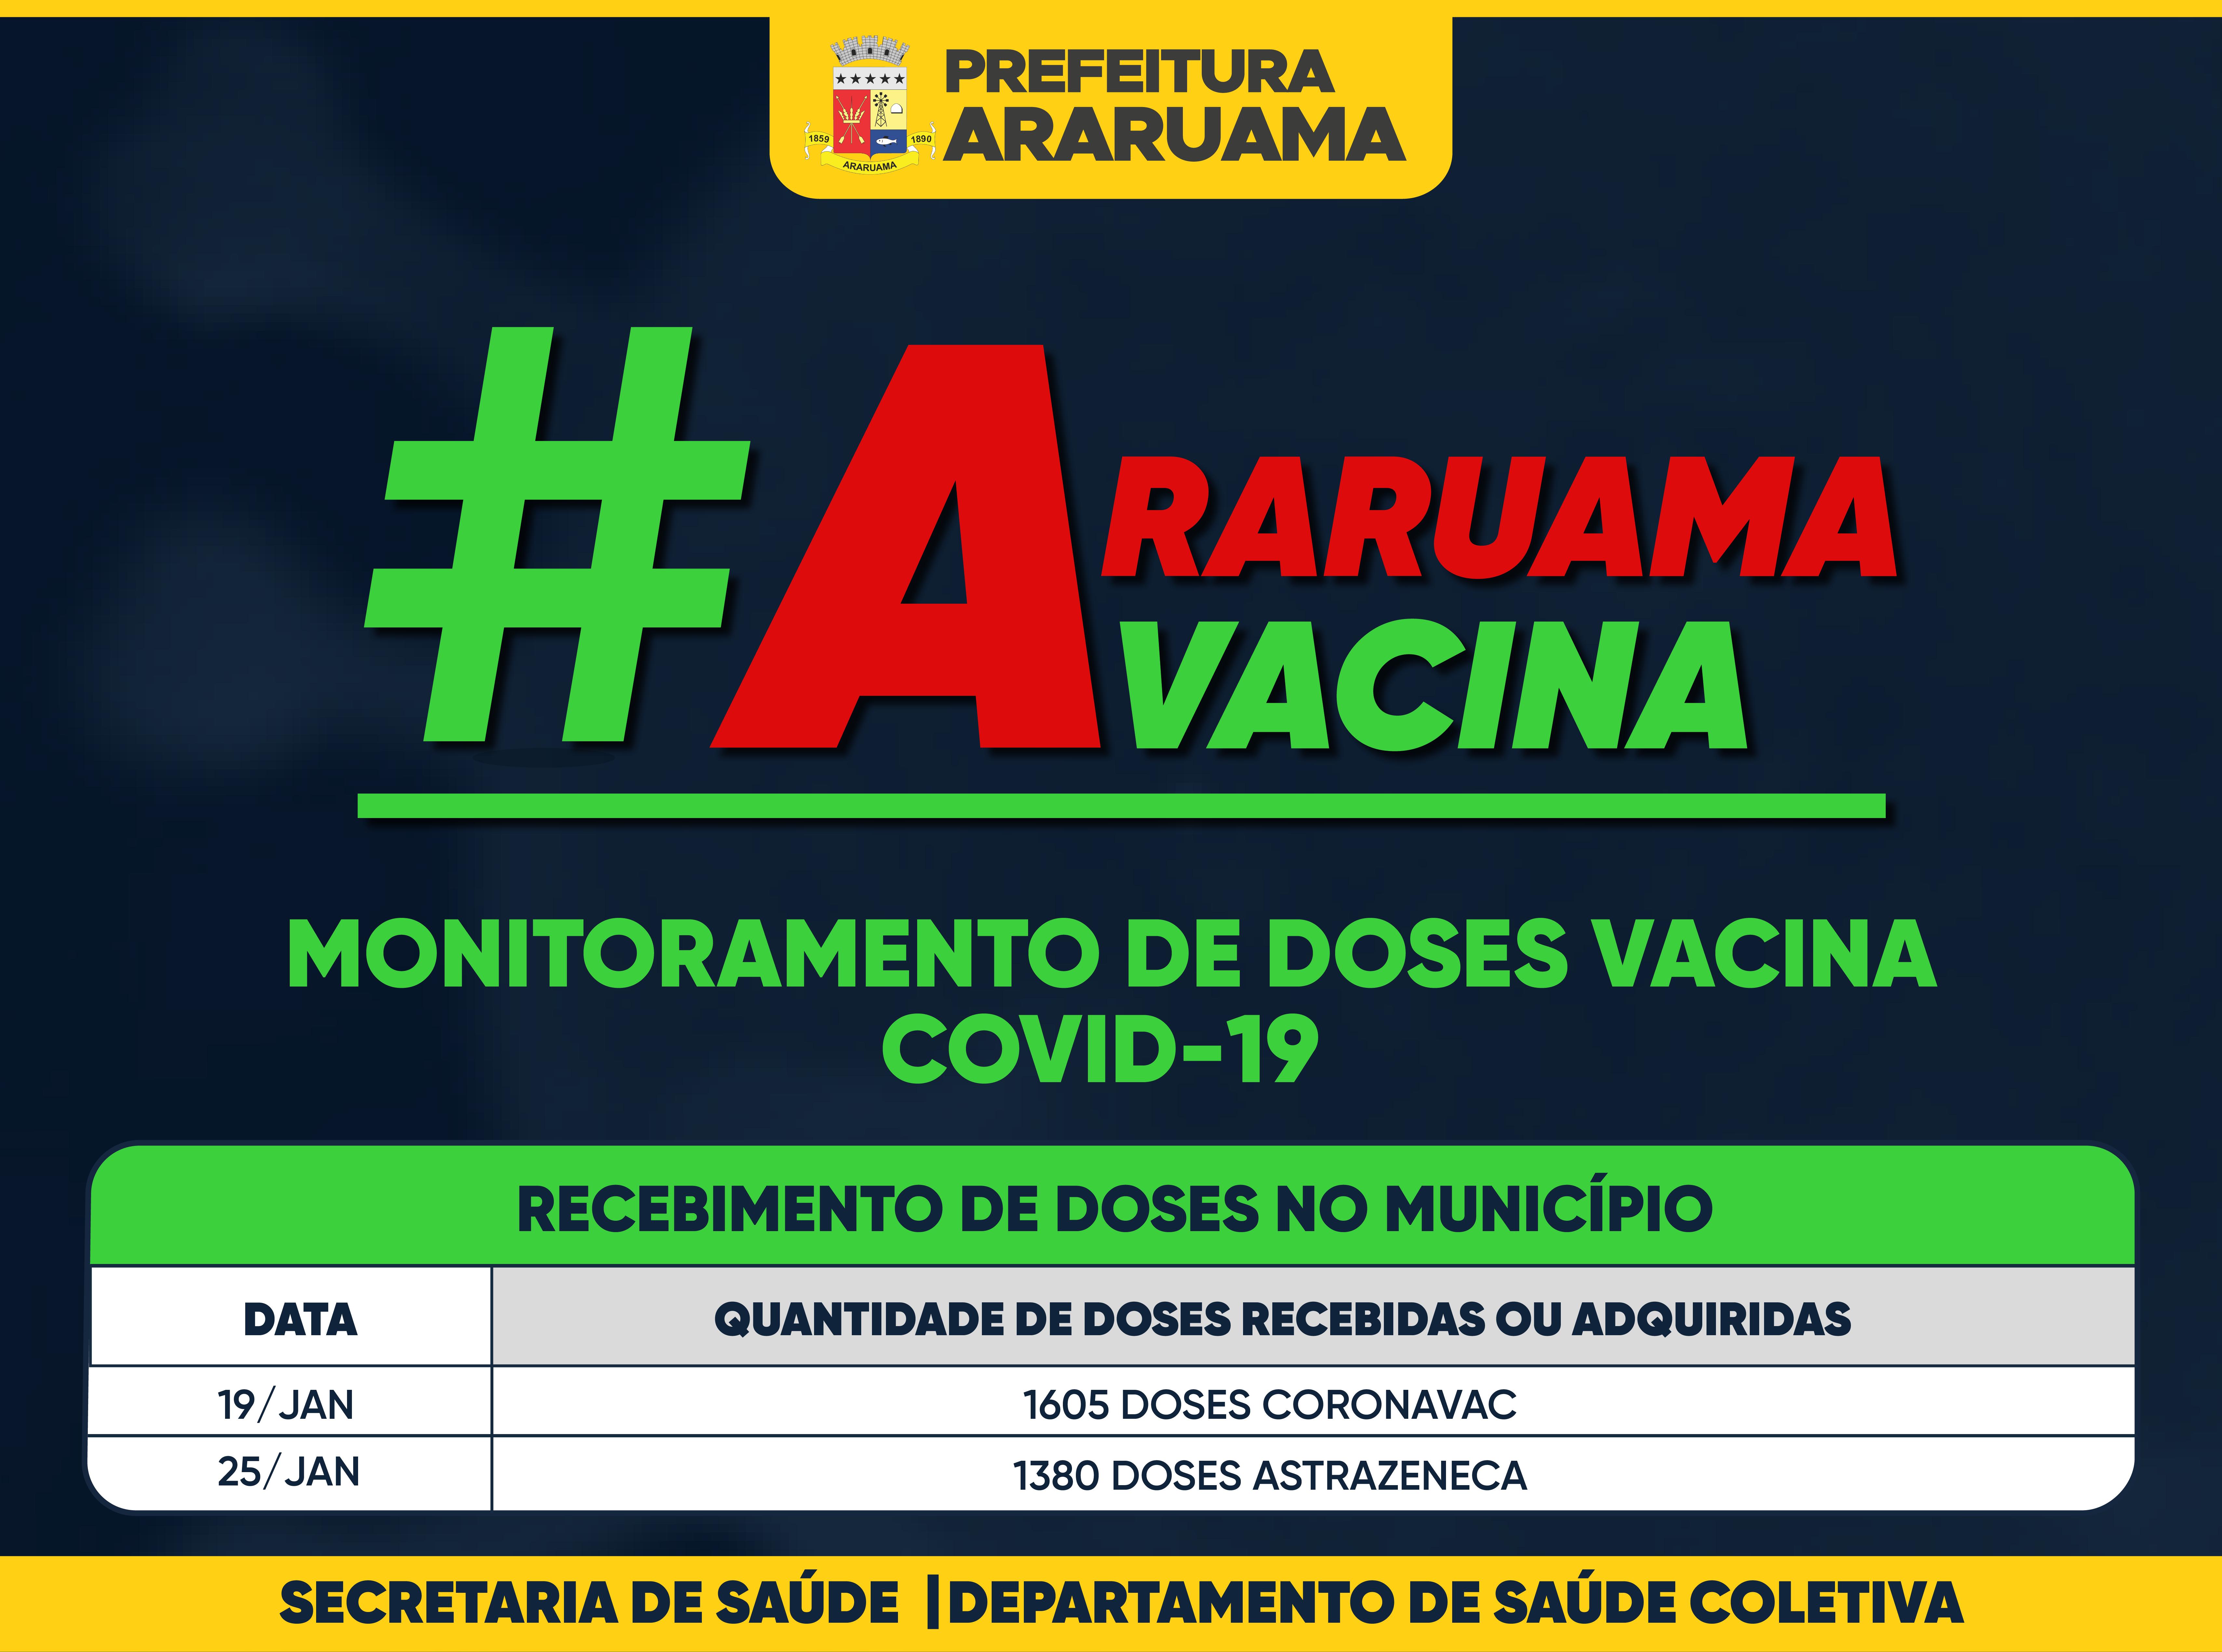 Vacina COVID-19 — Monitoramento de  recebimento de doses